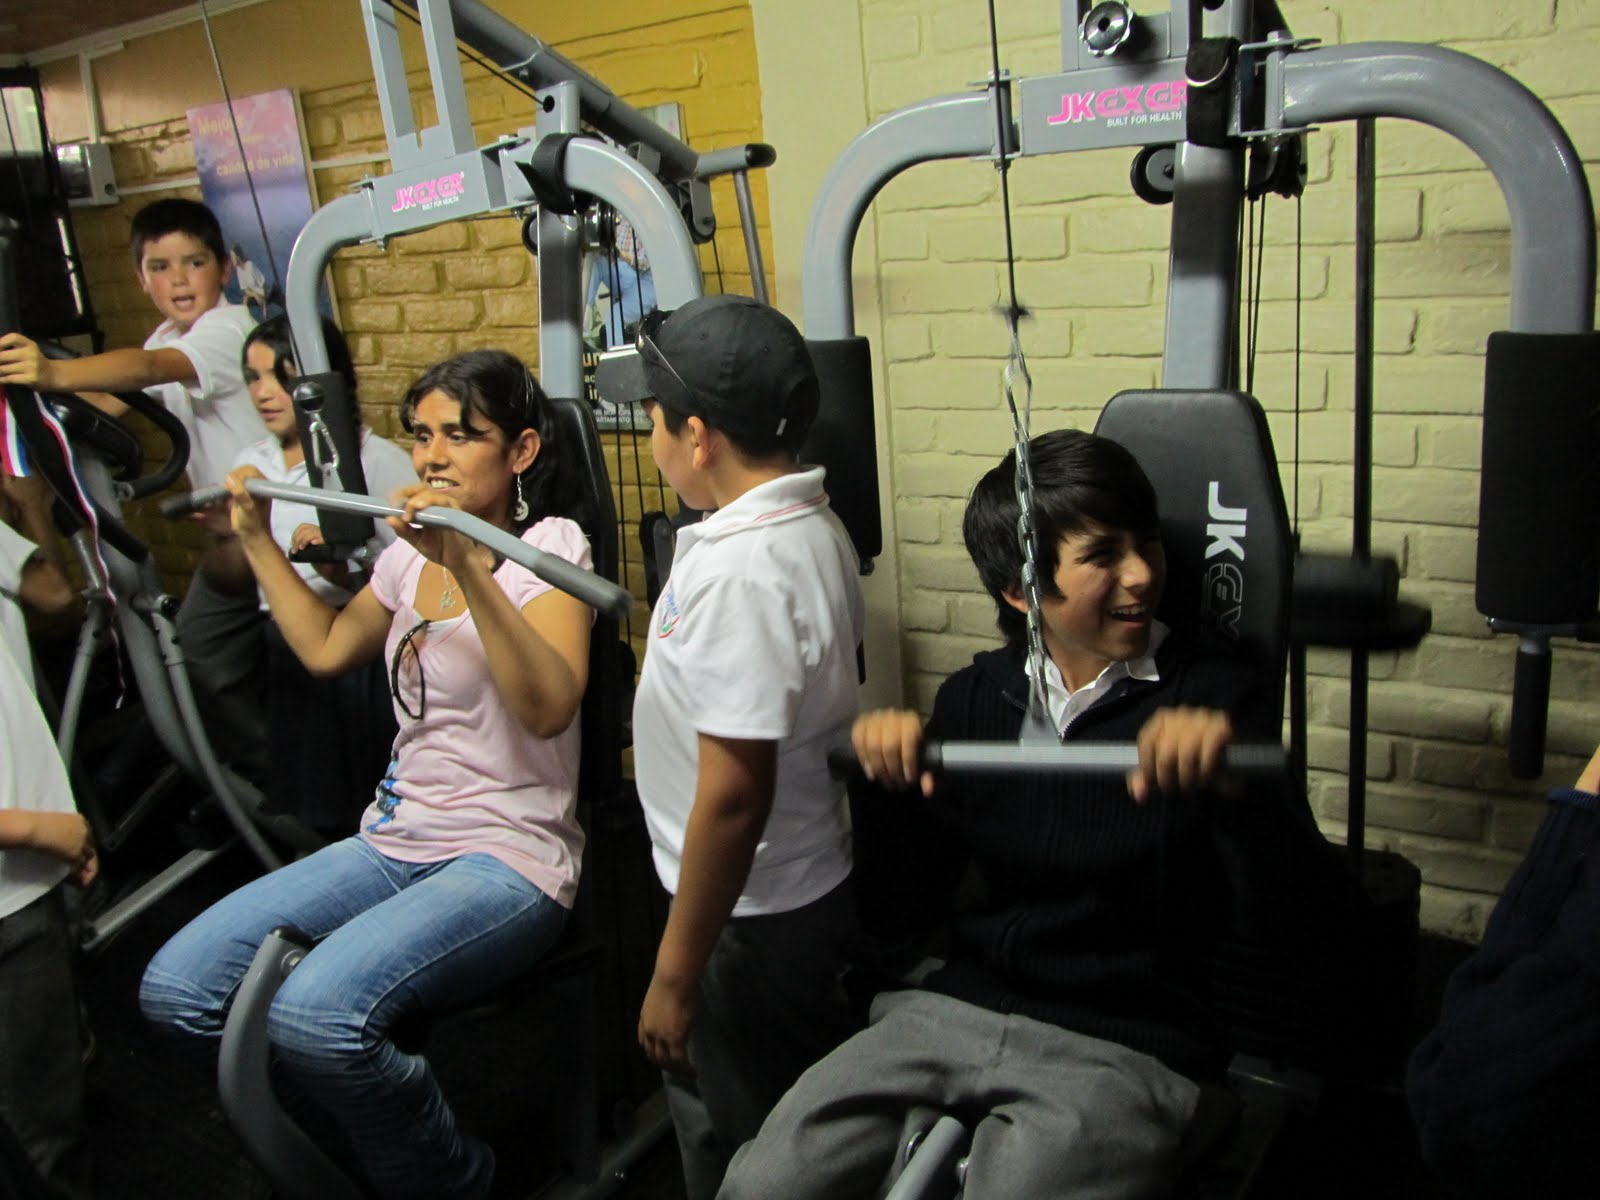 Olmuenoticias escuela lo narv ez inicia celebraciones de for Gimnasio narvaez